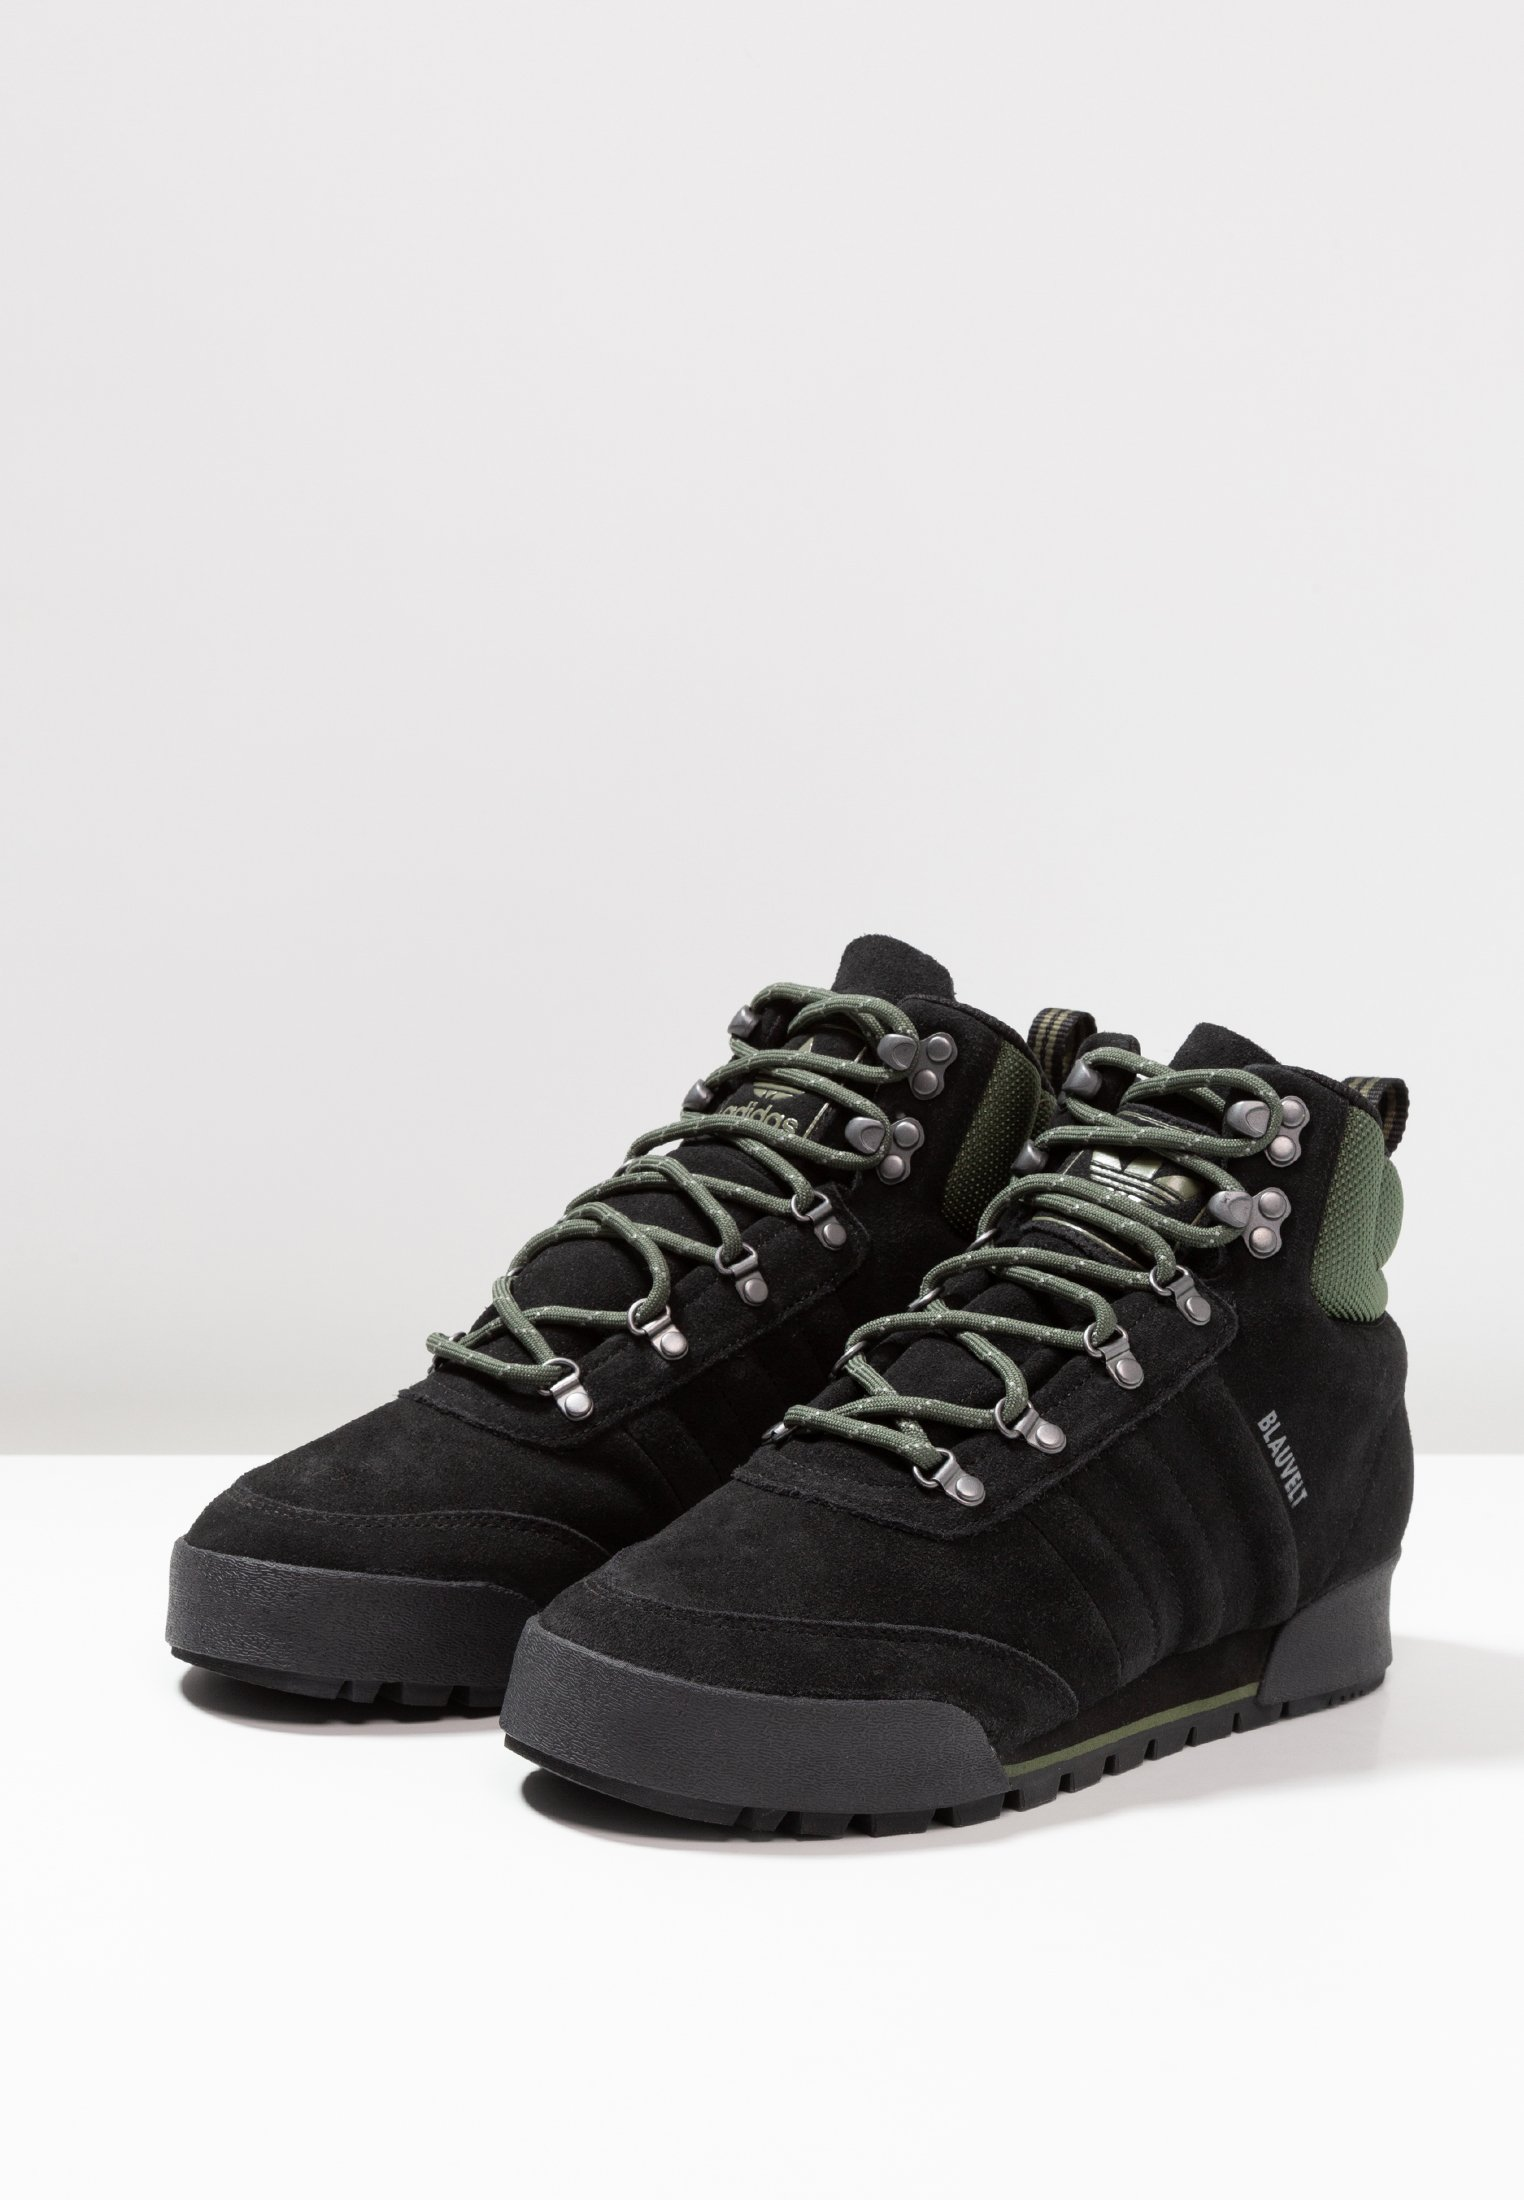 adidas Originals JAKE BOOT 2.0 Sneaker high black/schwarz